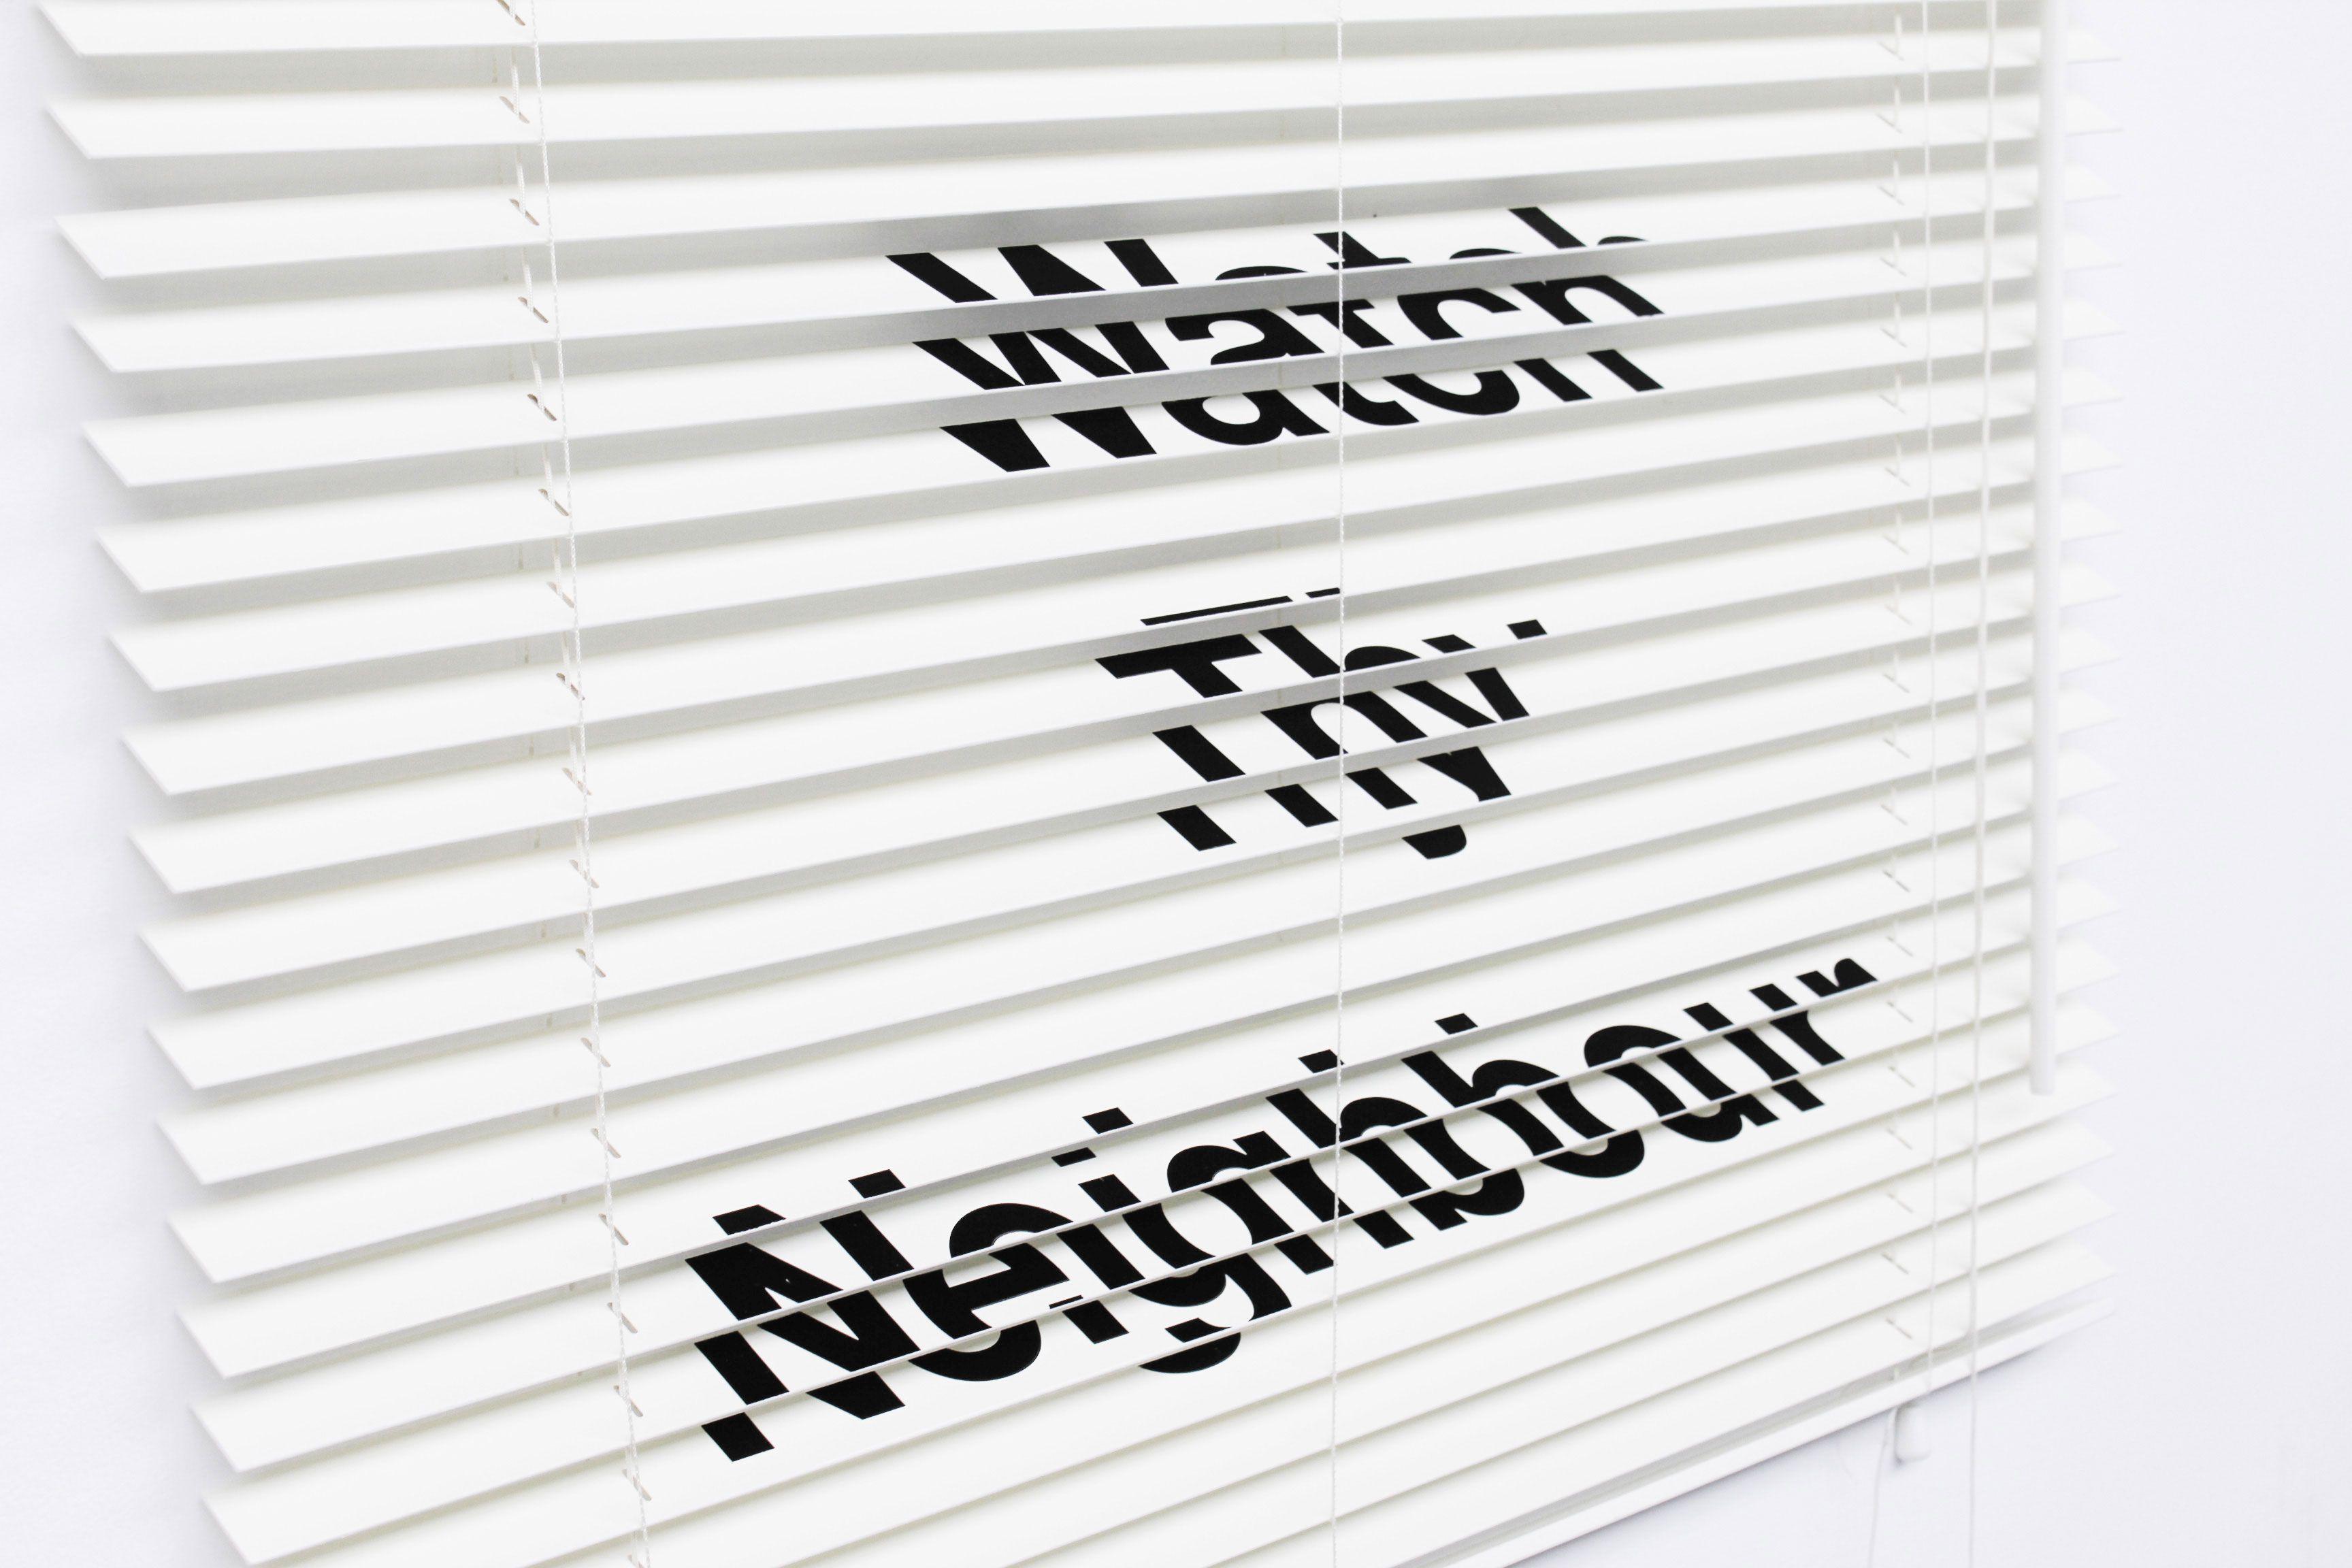 Watch Thy Neighbour - Cj Brown